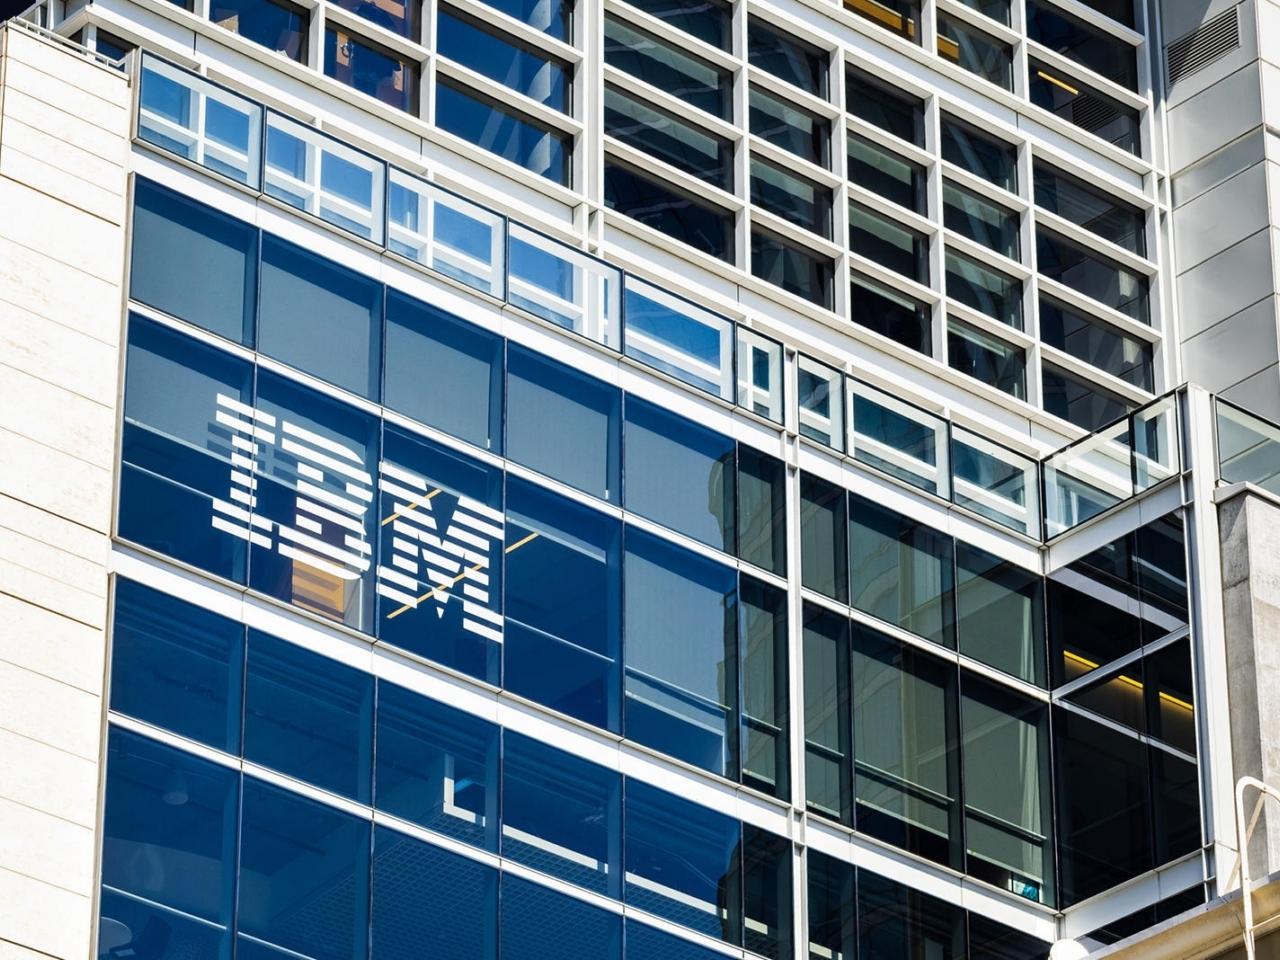 IBM Cloud IntegrationのGMに聞く--ハイブリッドクラウド、自動化、API - ZDNet Japan